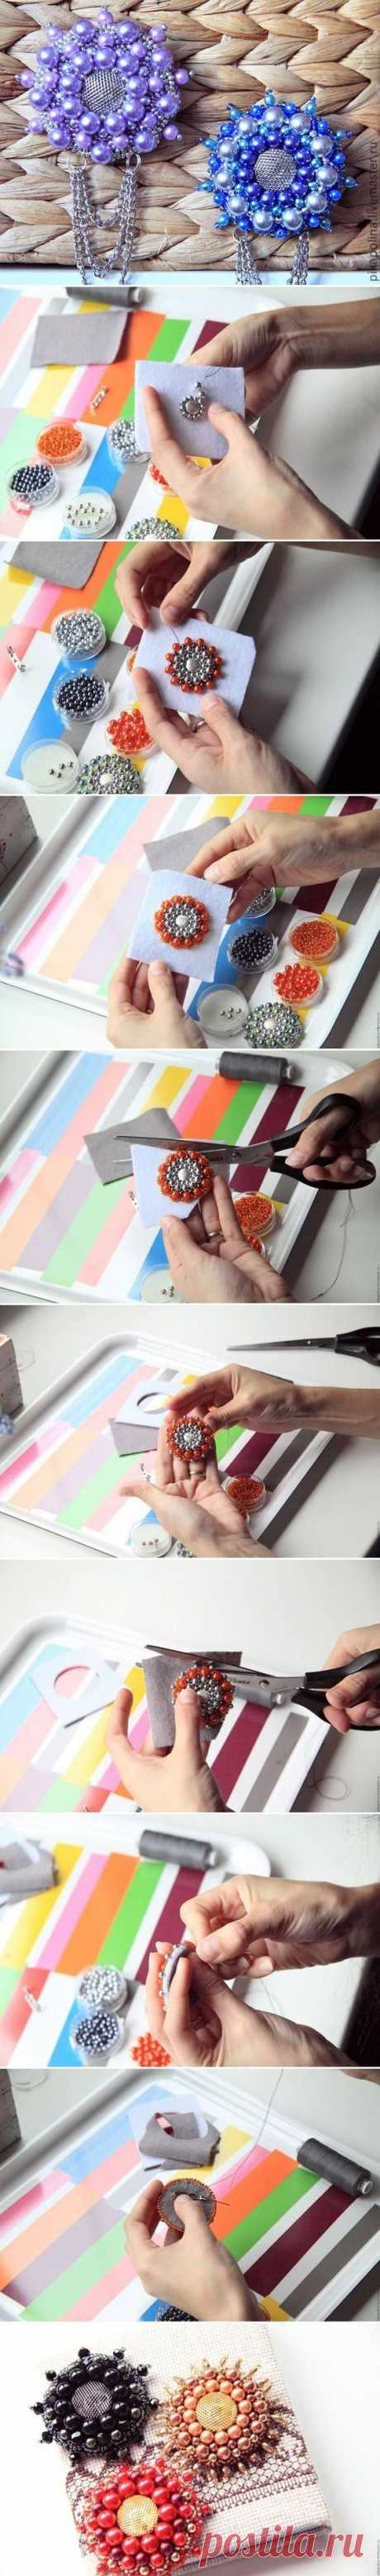 DIY Beads Flower Brooch | beads